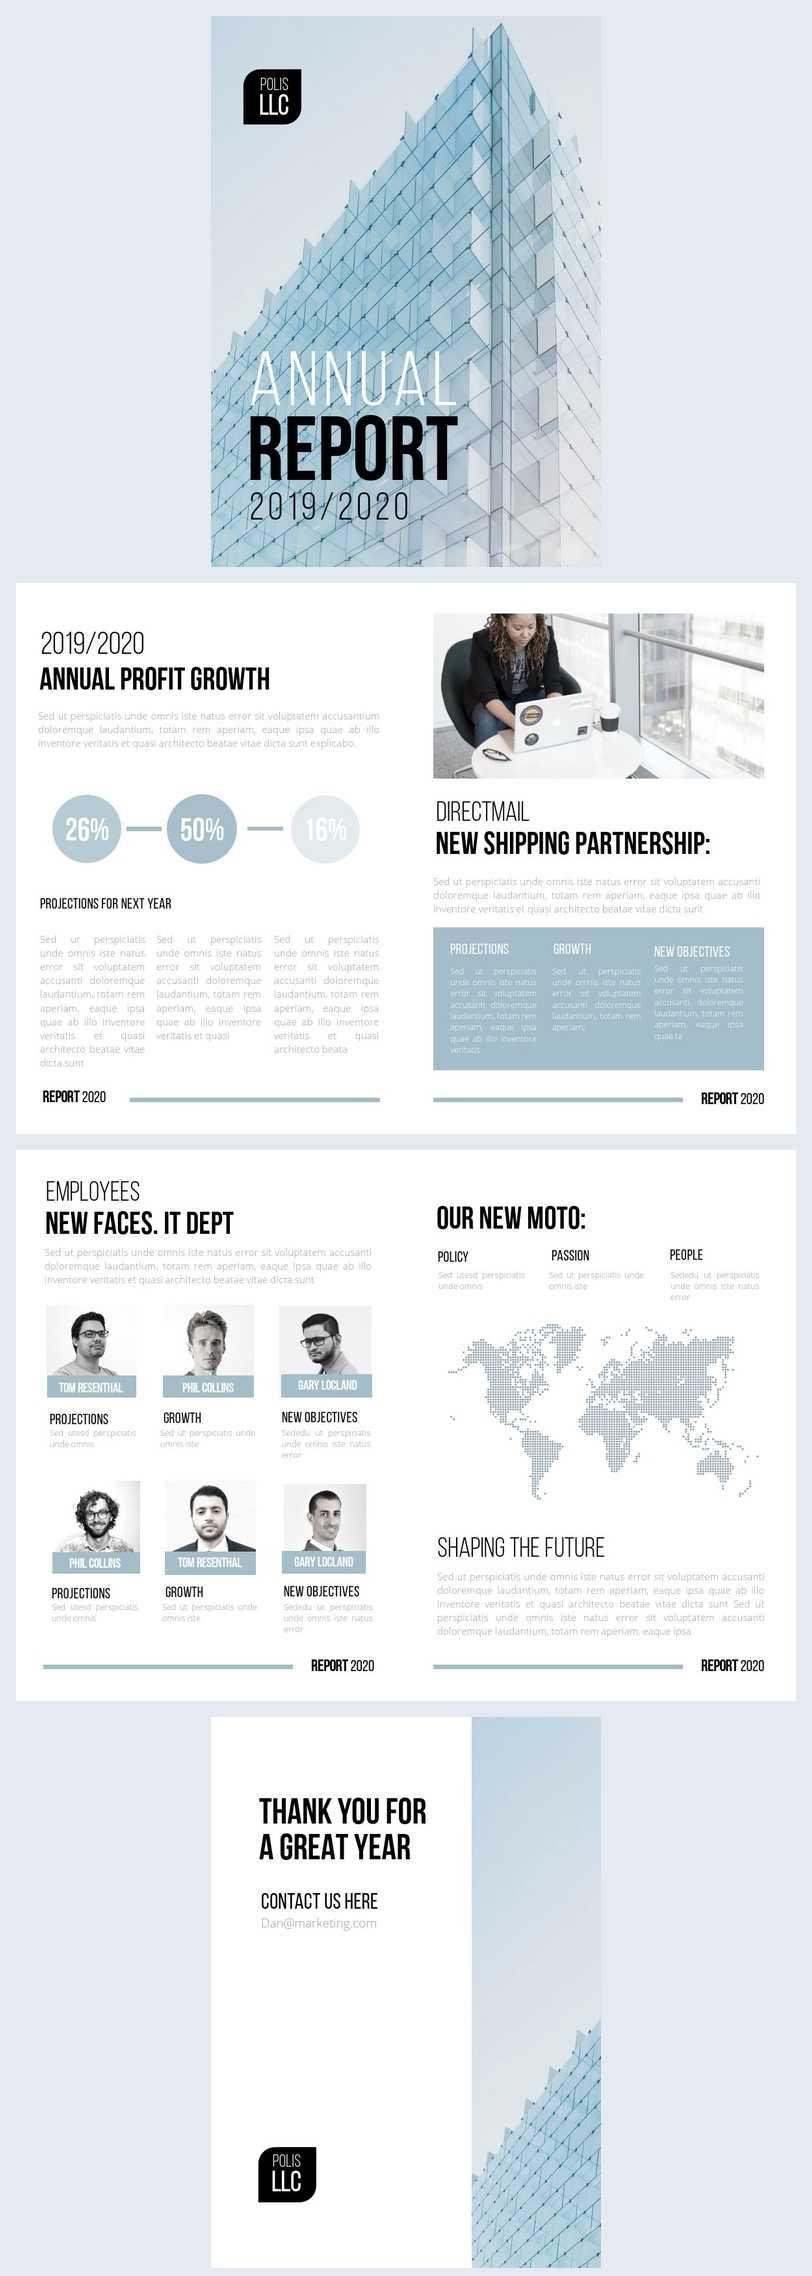 Free Modern Llc Annual Report Template - Flipsnack Inside Llc Annual Report Template